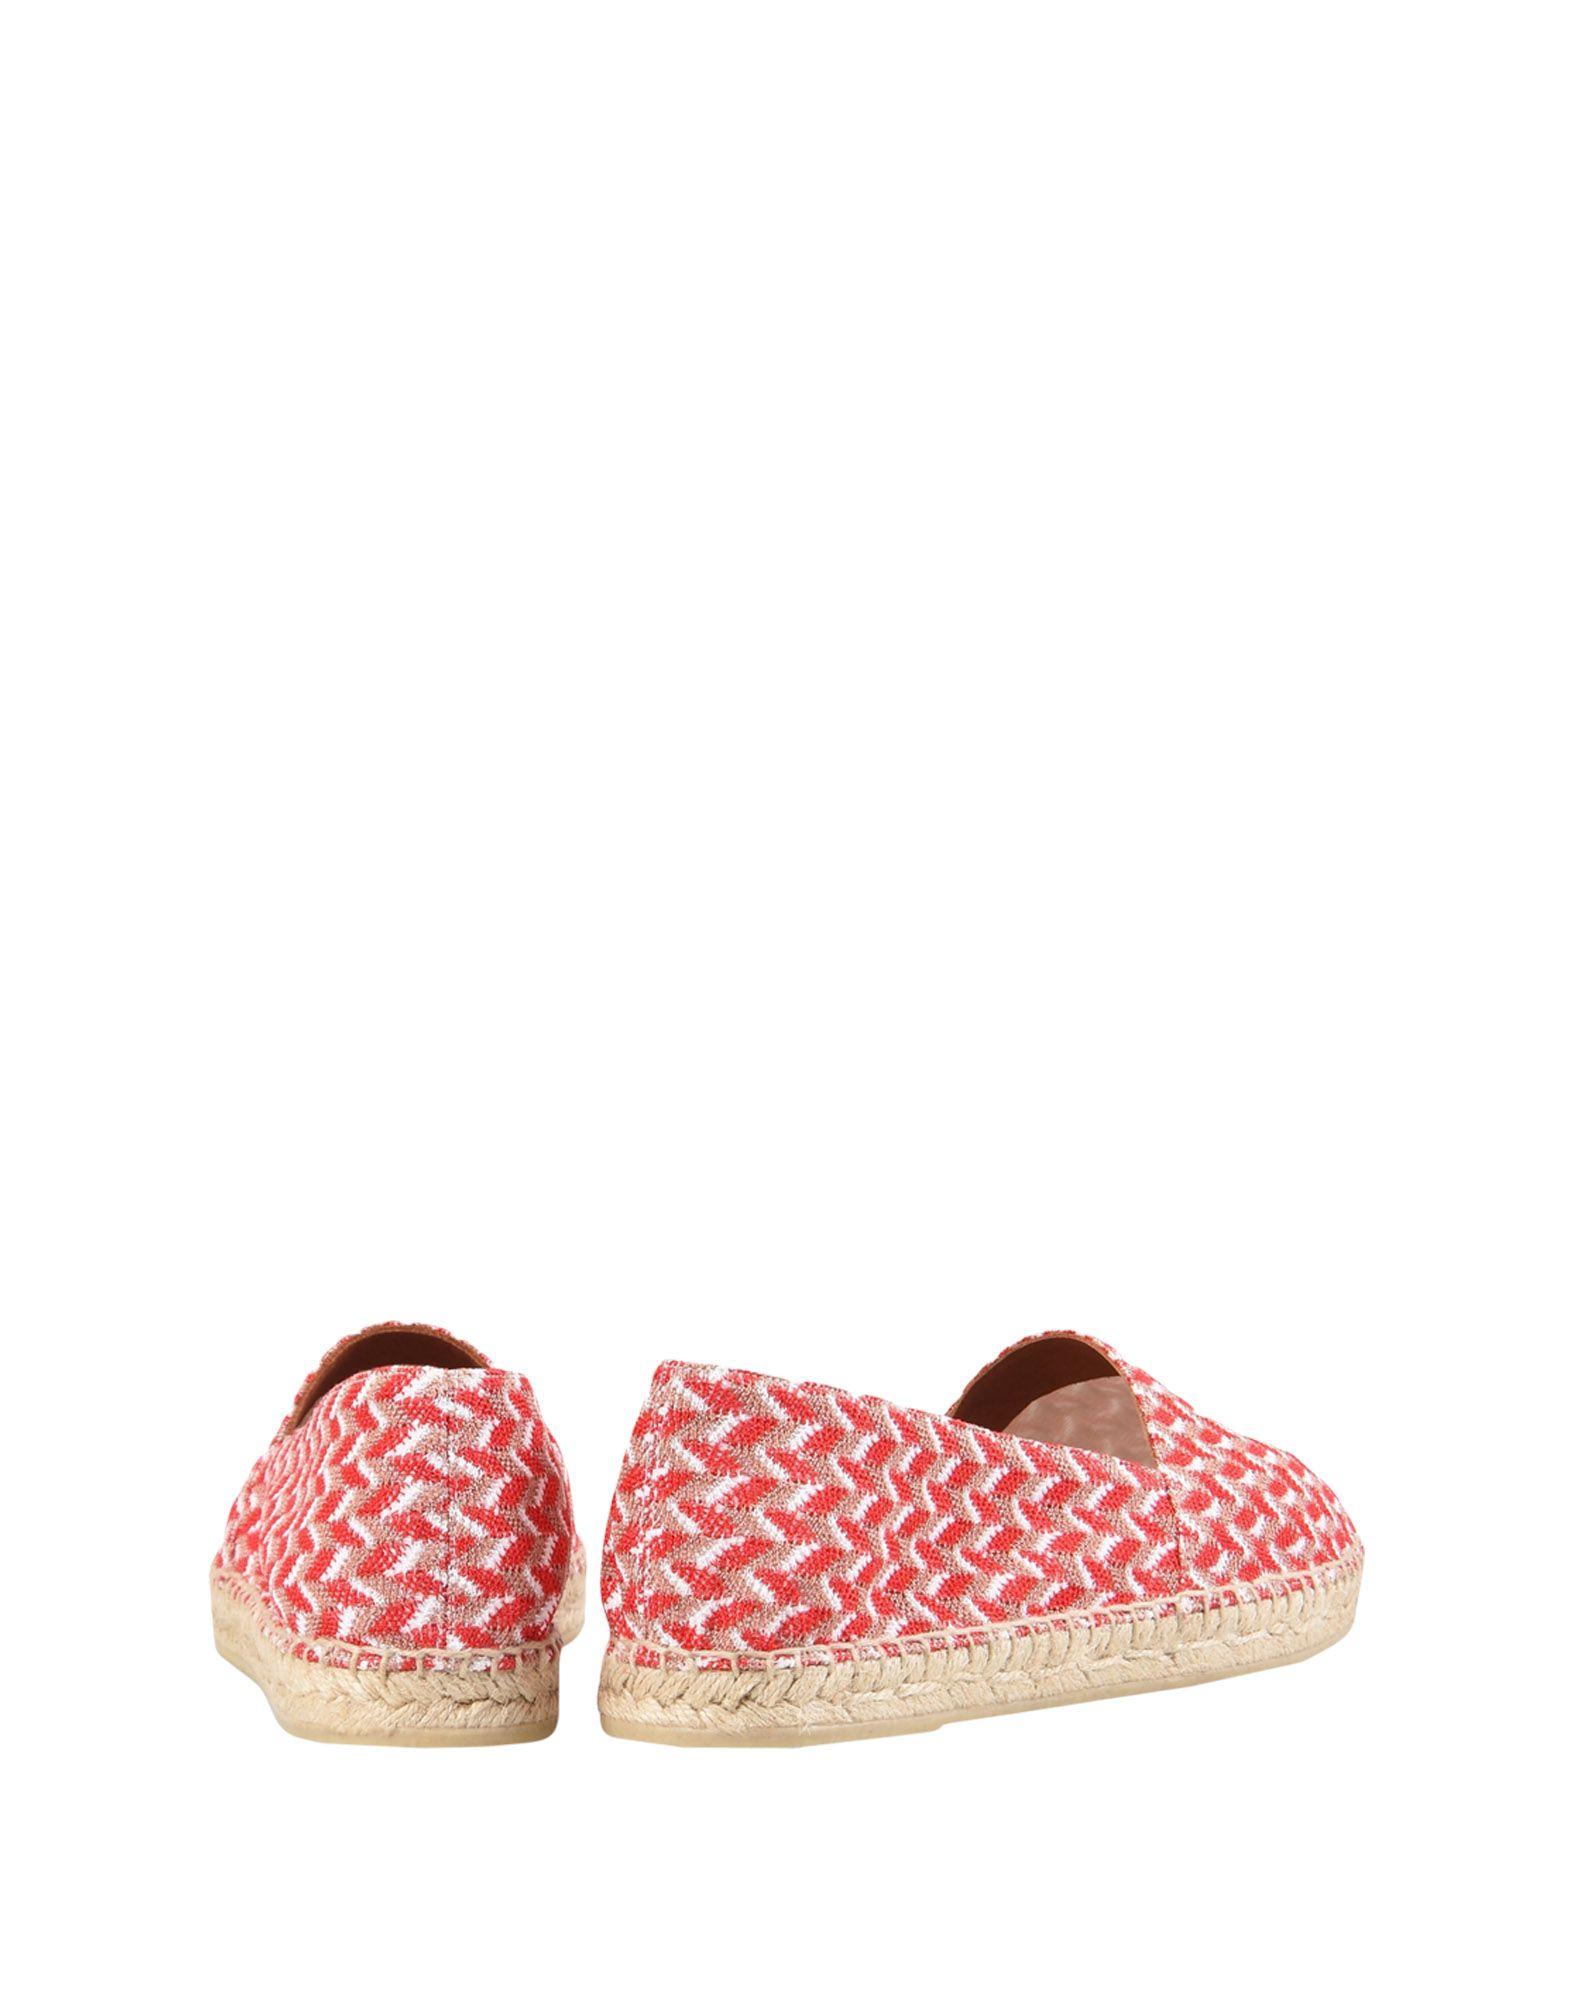 Stilvolle billige Schuhe Missoni Espadrilles 11424788XN Damen  11424788XN Espadrilles 4ac575